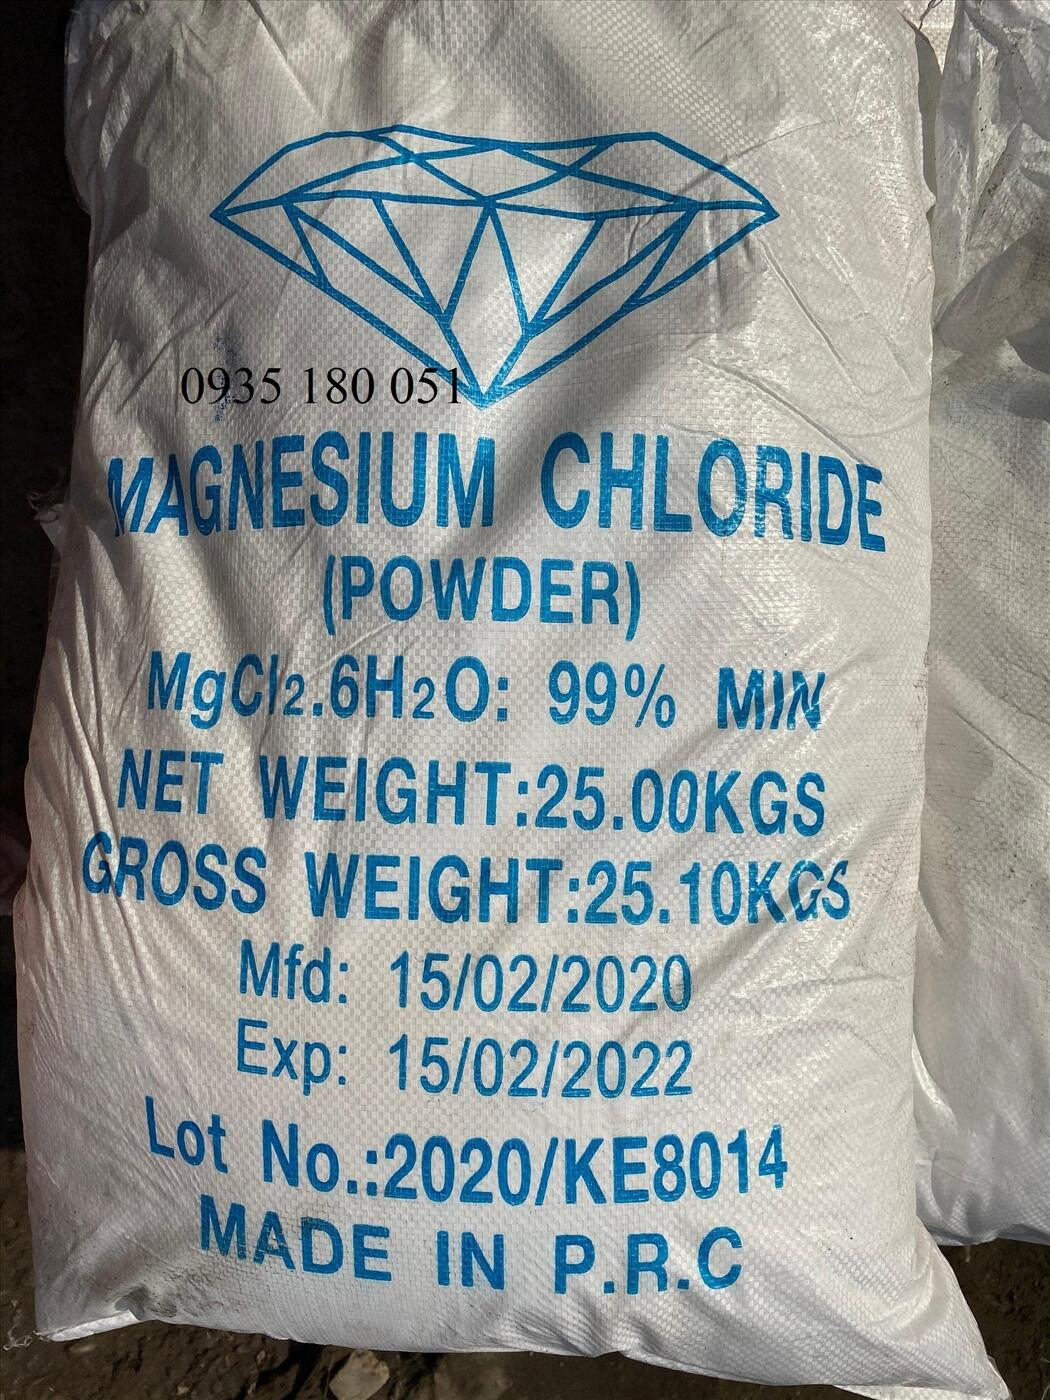 Magie chloride MgCl2.6H2O 99%